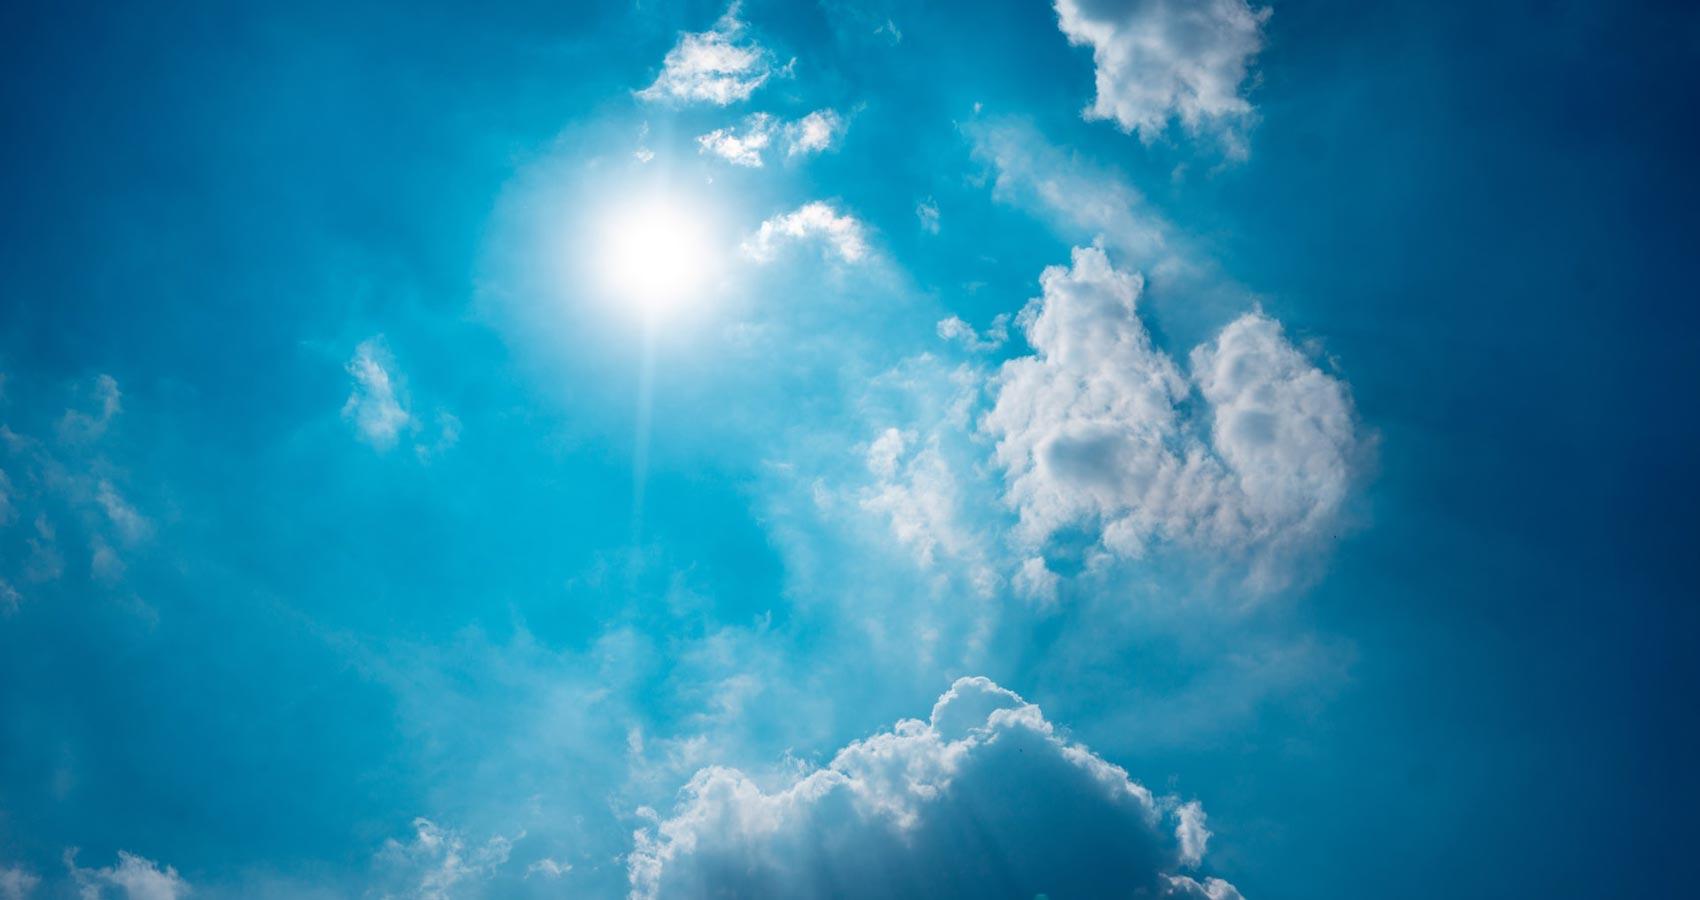 An Ode to The Blue Sun, poetry by Svetlina Trifonova at Spillwords.com